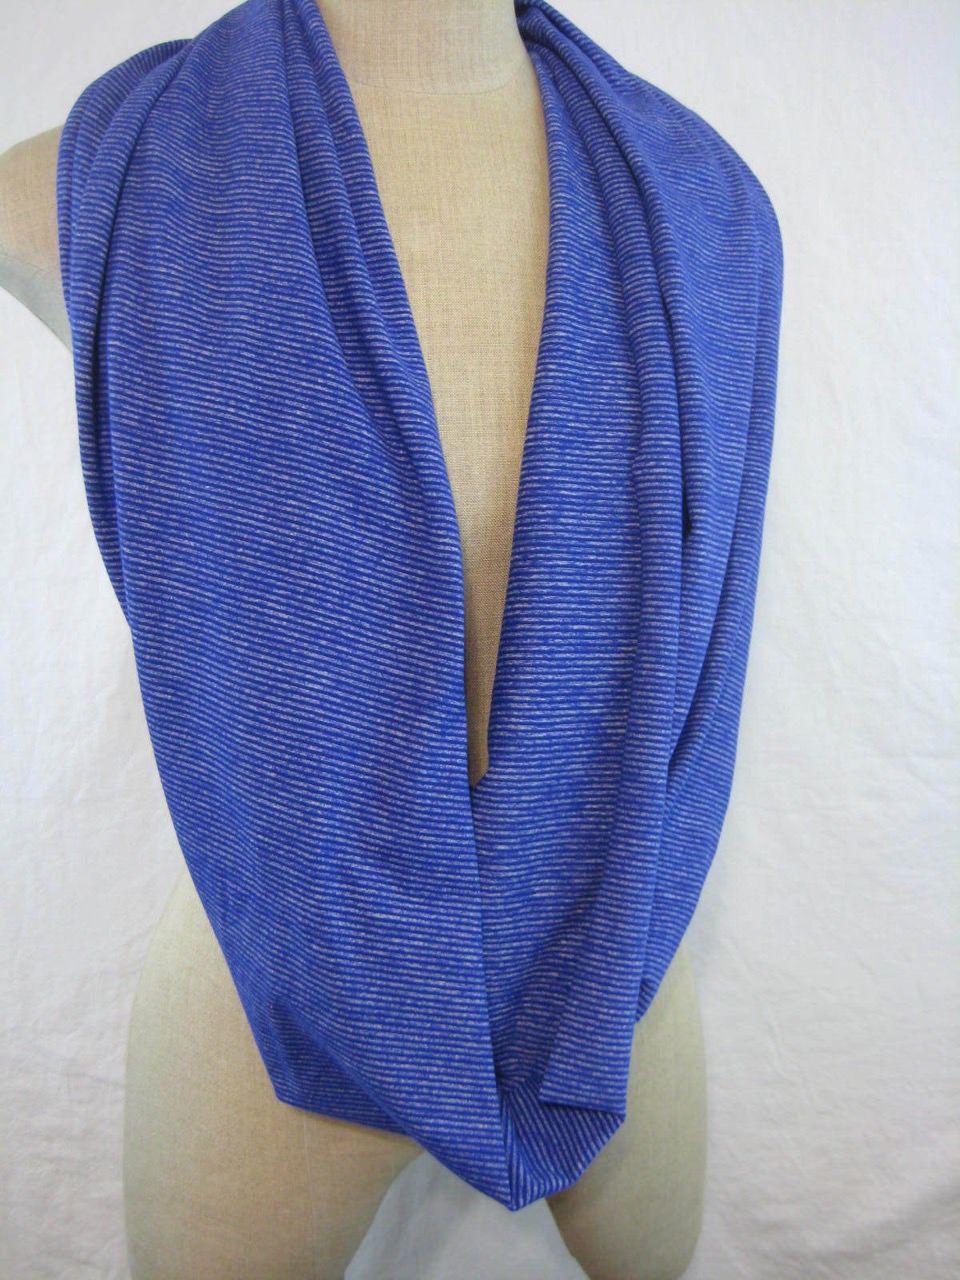 Lululemon Vinyasa Scarf *Rulu - Tonka Stripe Pigment Blue / Heathered Pigment Blue